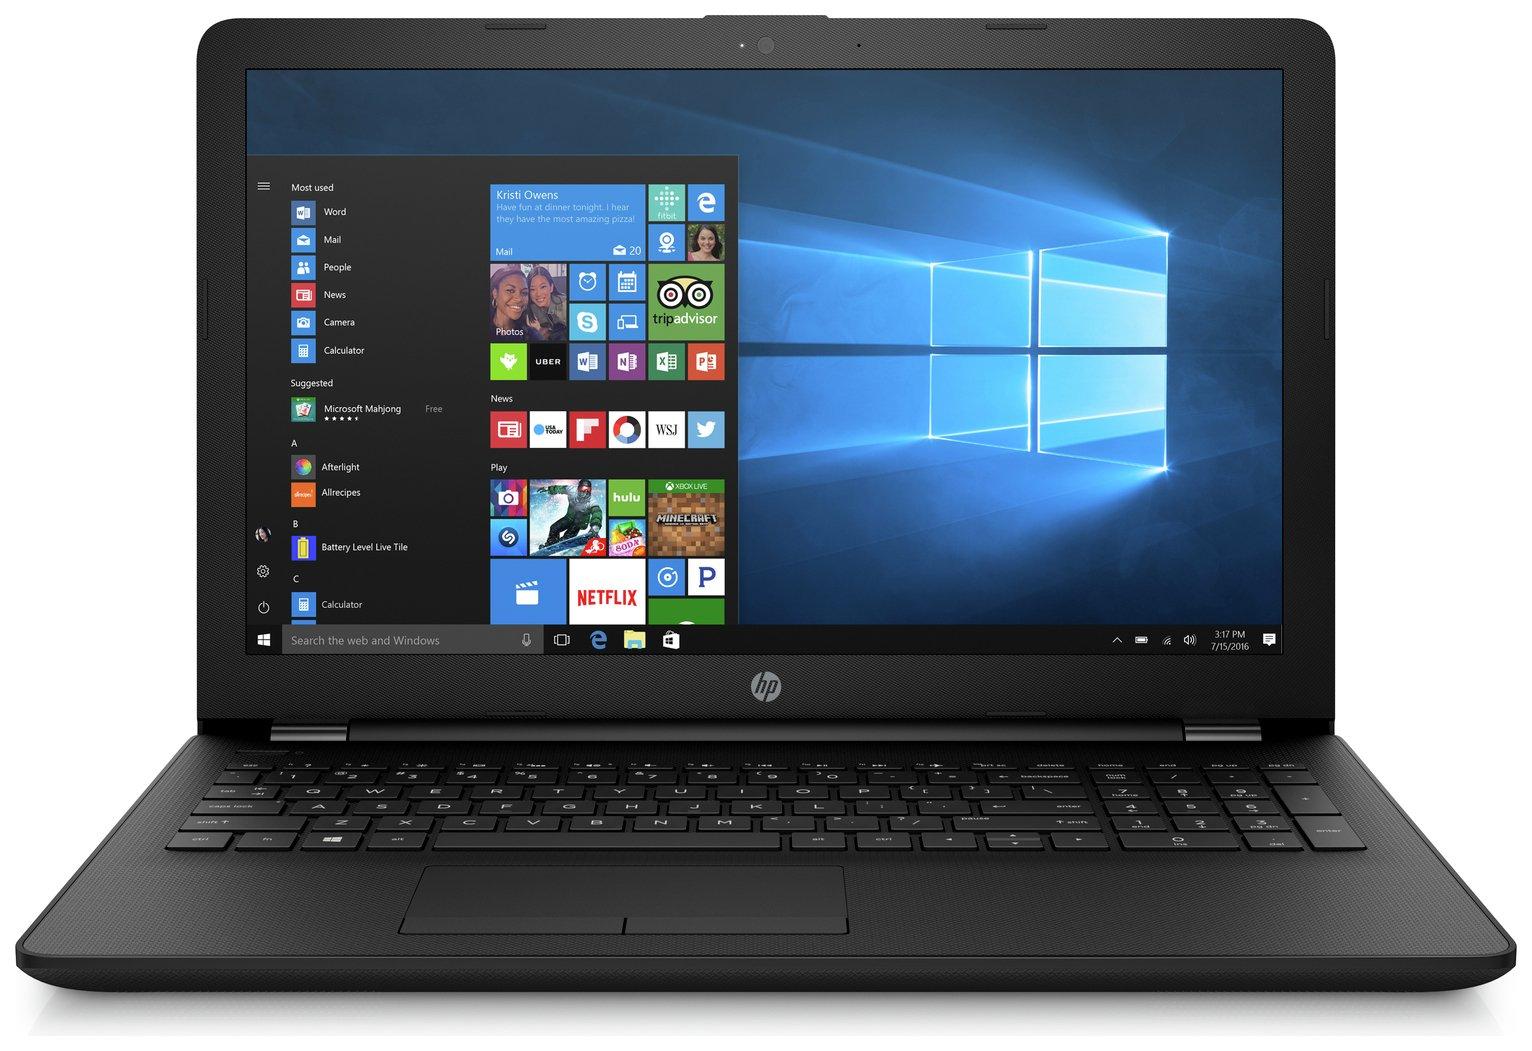 HP 15.6 Inch Intel Celeron 4GB 1TB Laptop - Black